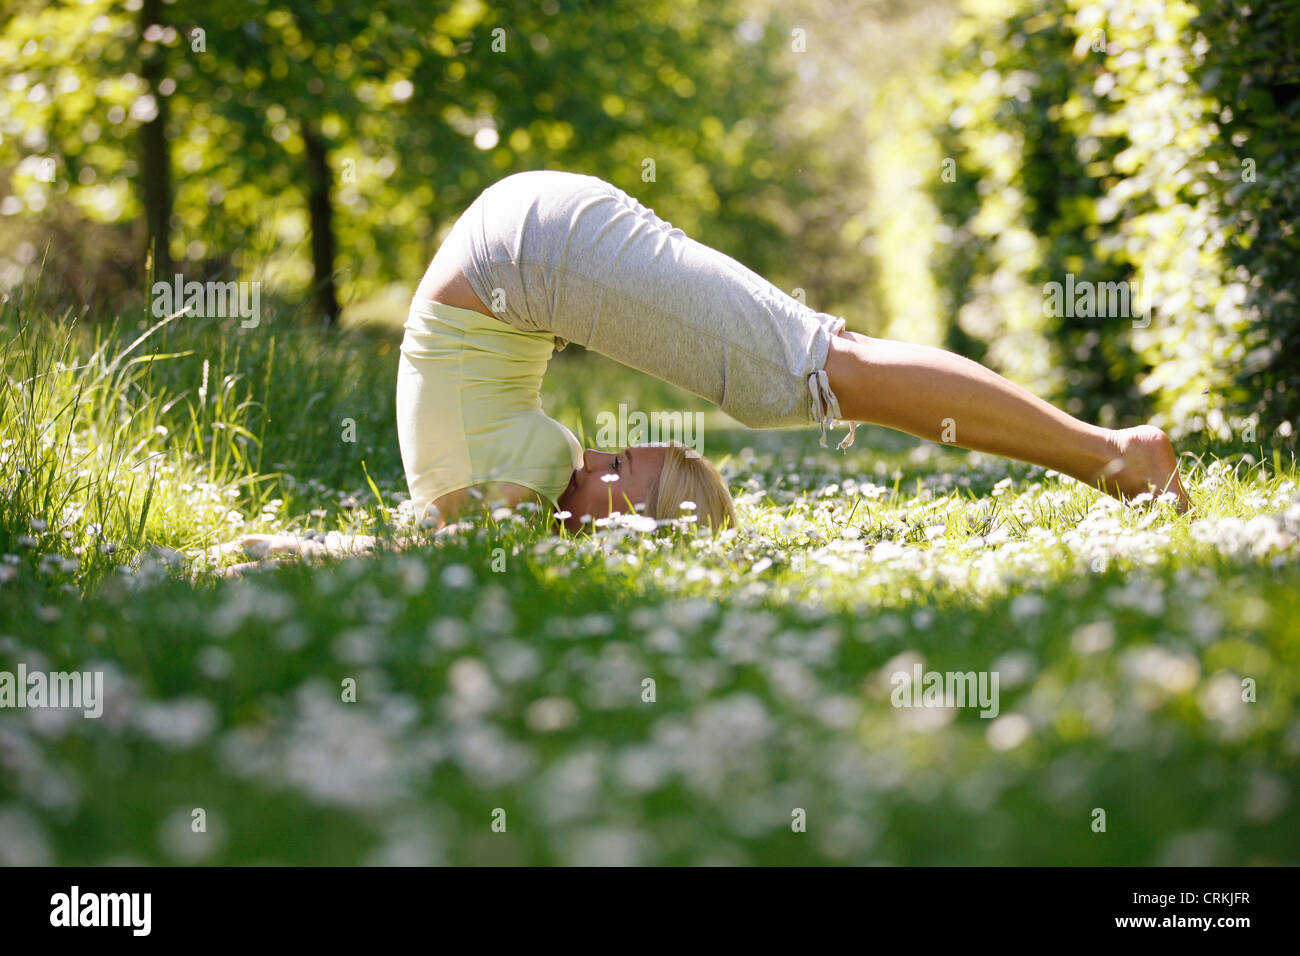 Eine junge Frau praktizieren Yoga außerhalb Pflug-pose Stockbild